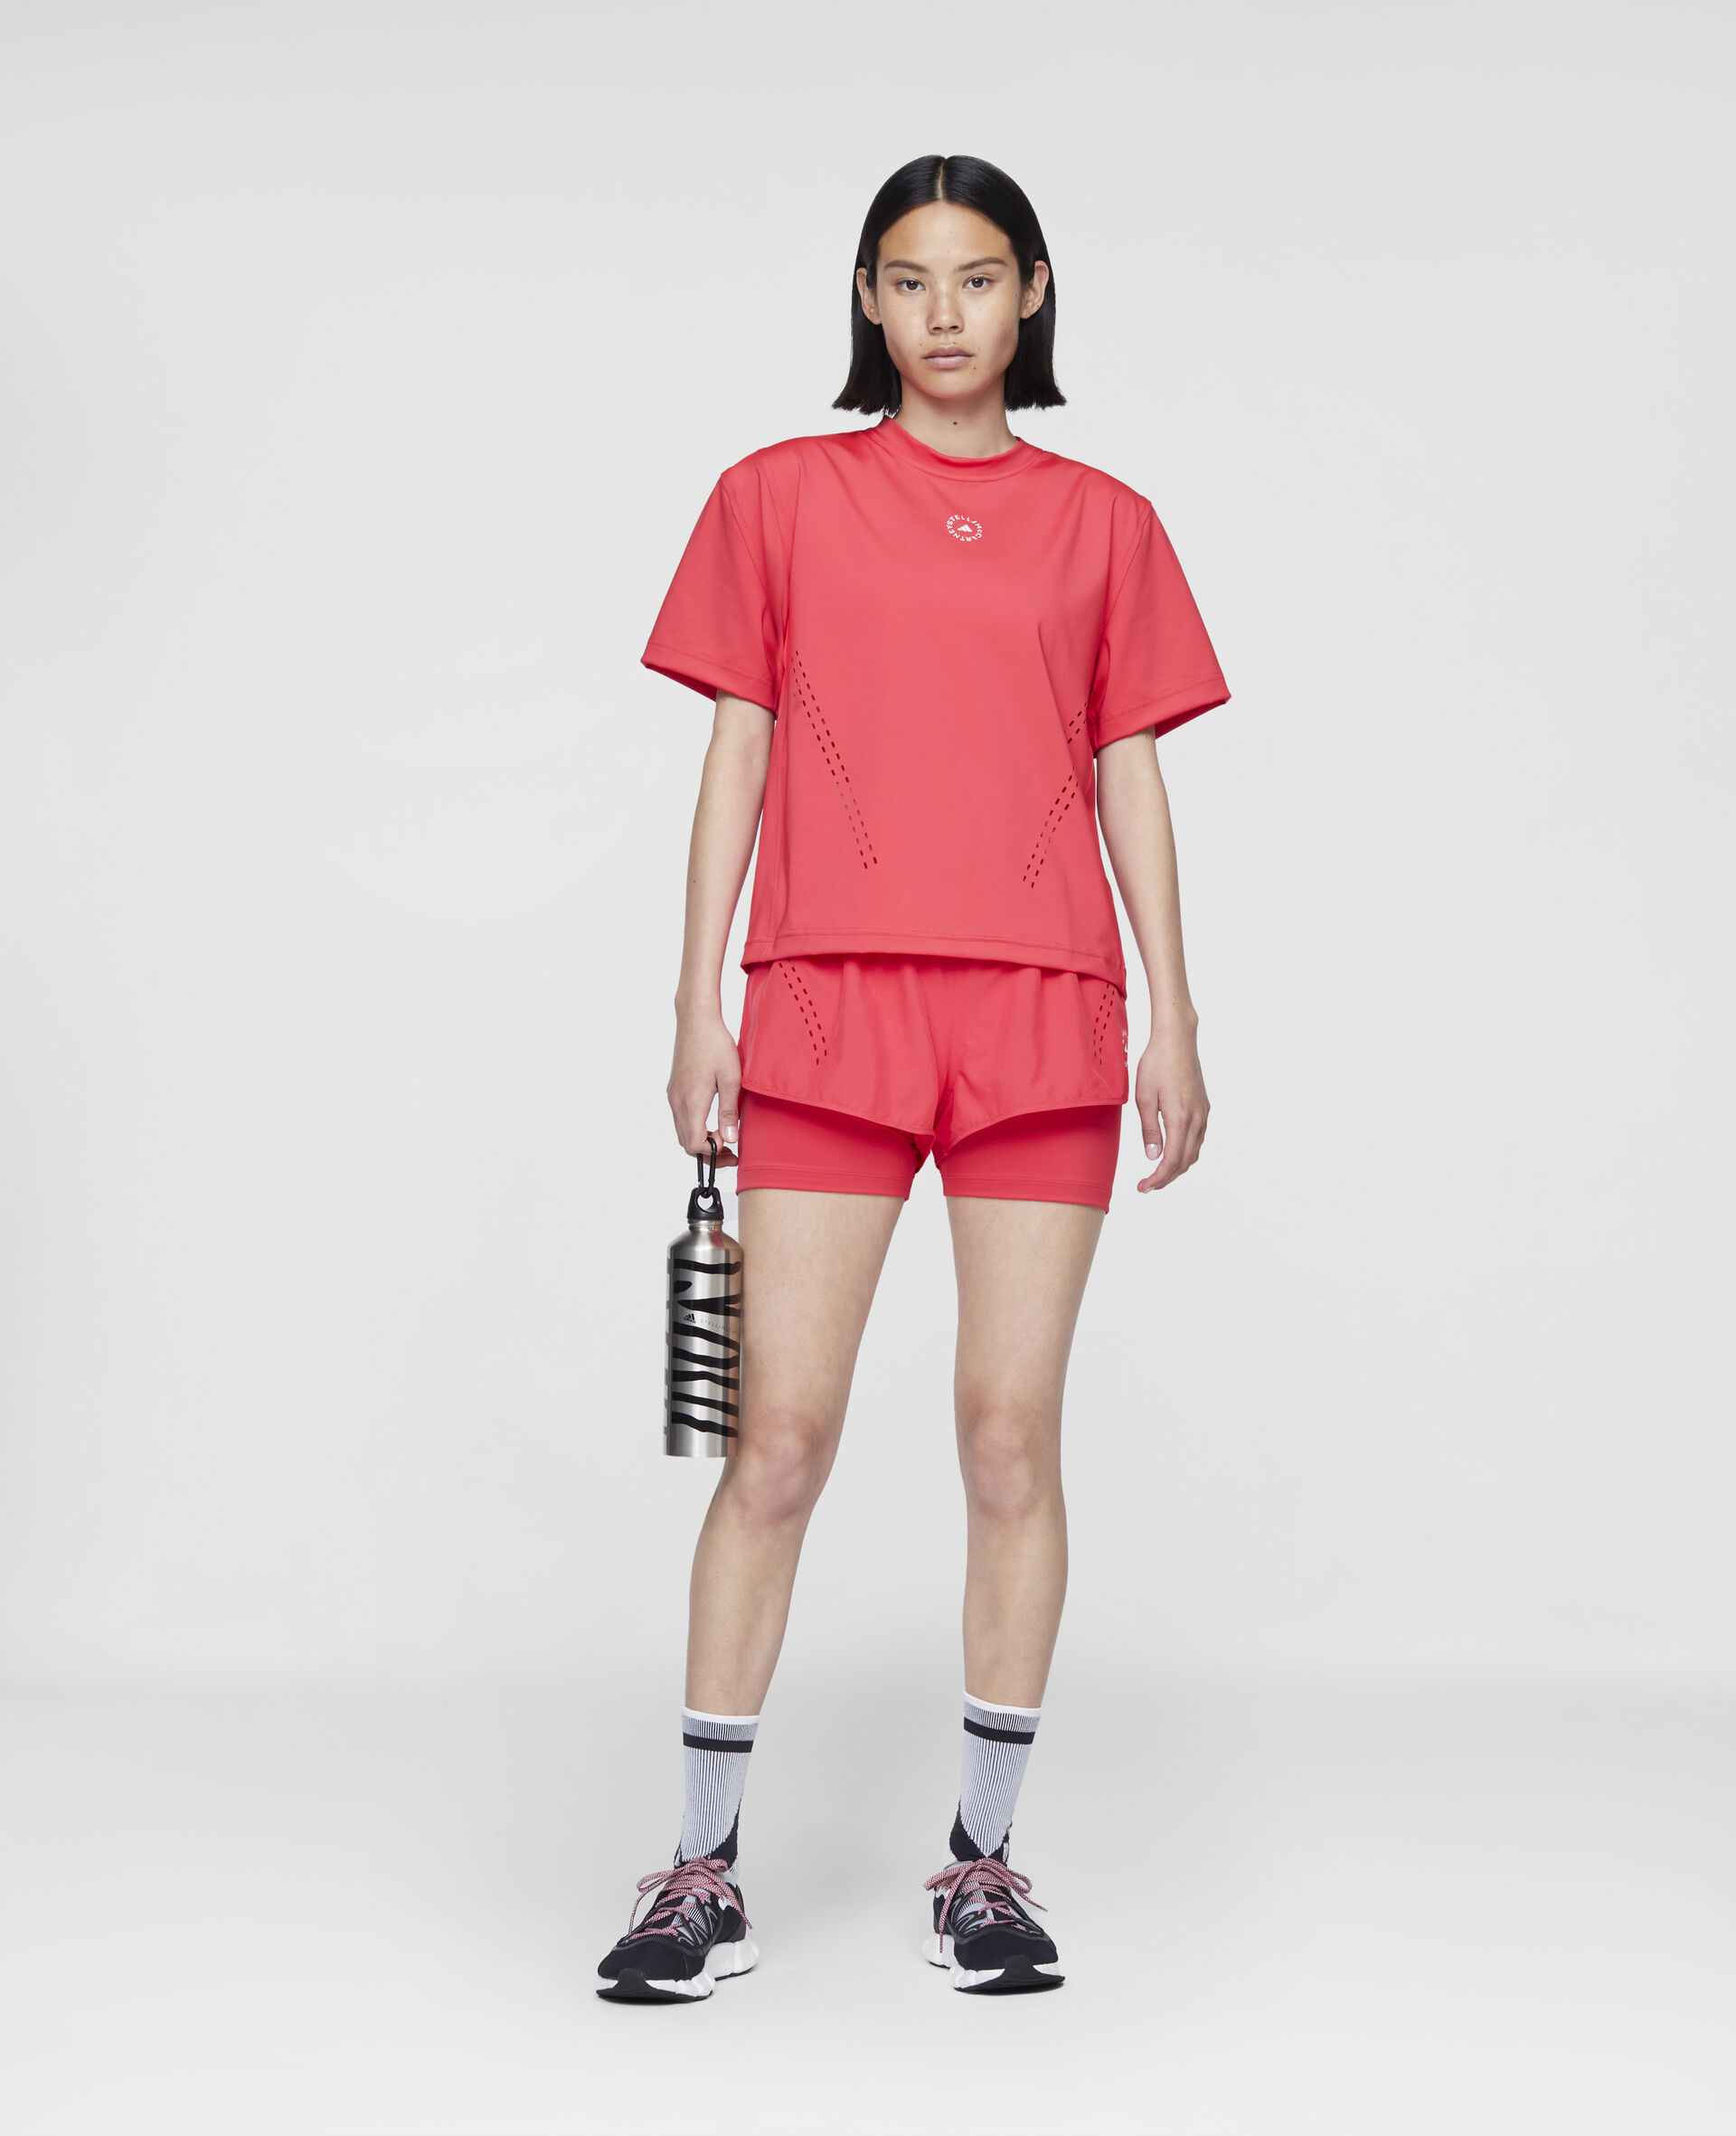 Rosa Trainings-T-Shirt-Rose-large image number 1